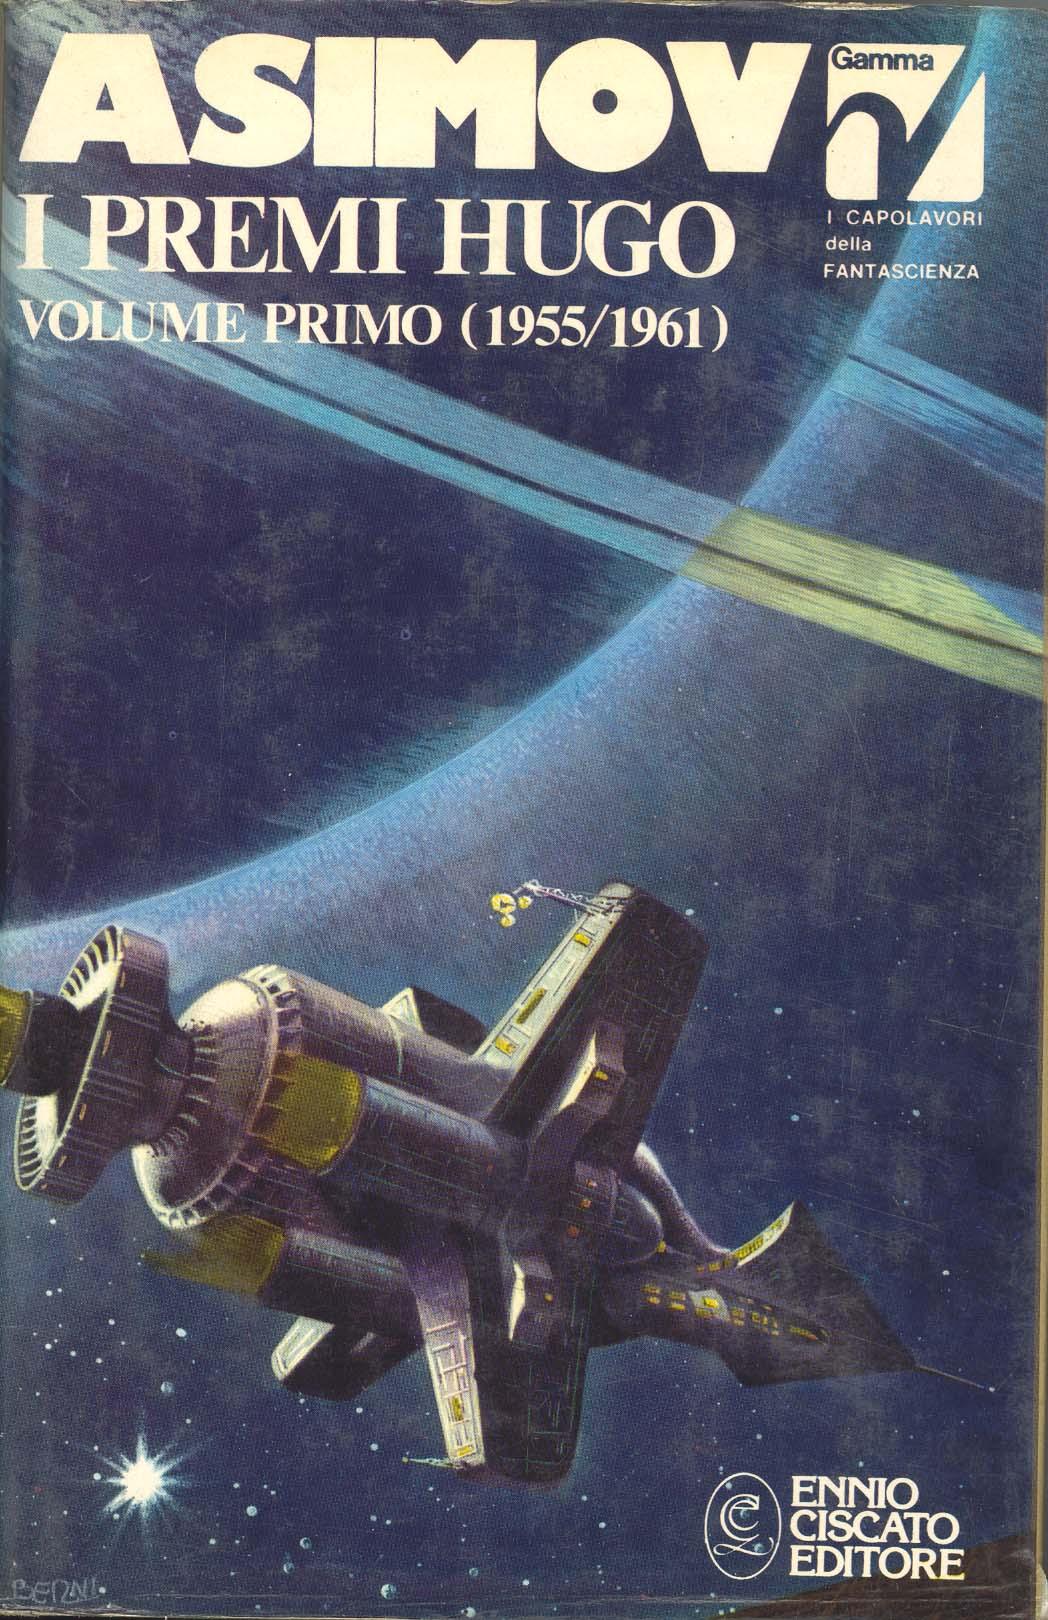 I premi Hugo - Volume primo ( 1955 / 1961 )